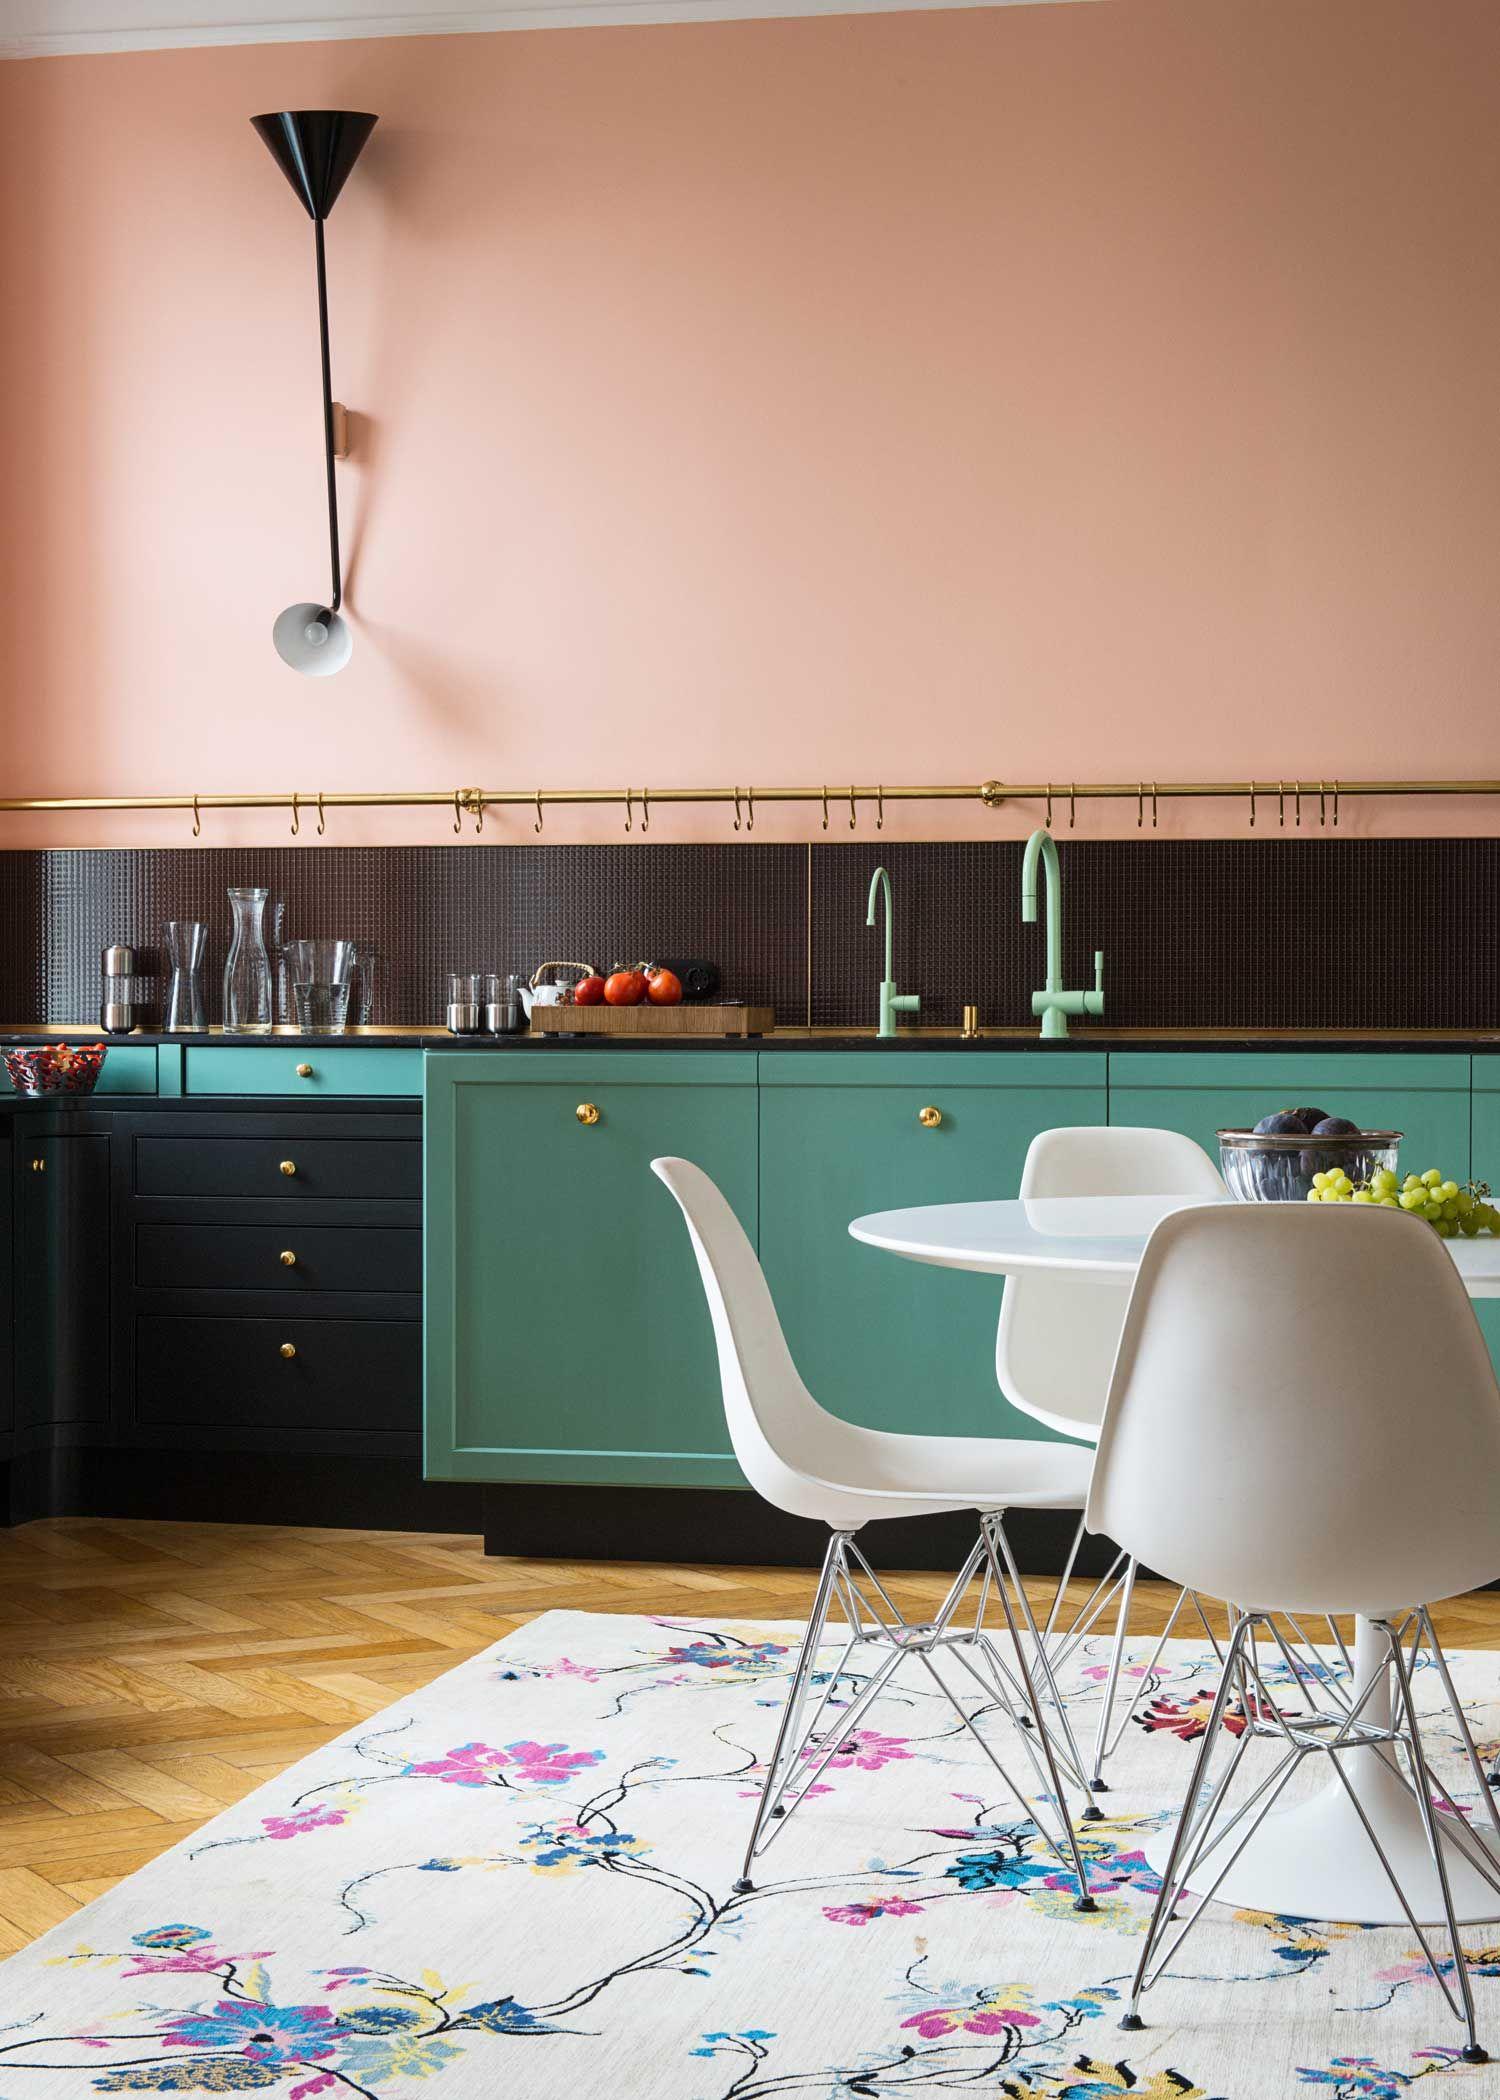 Spring Scandinavian Decor Green Cabinets